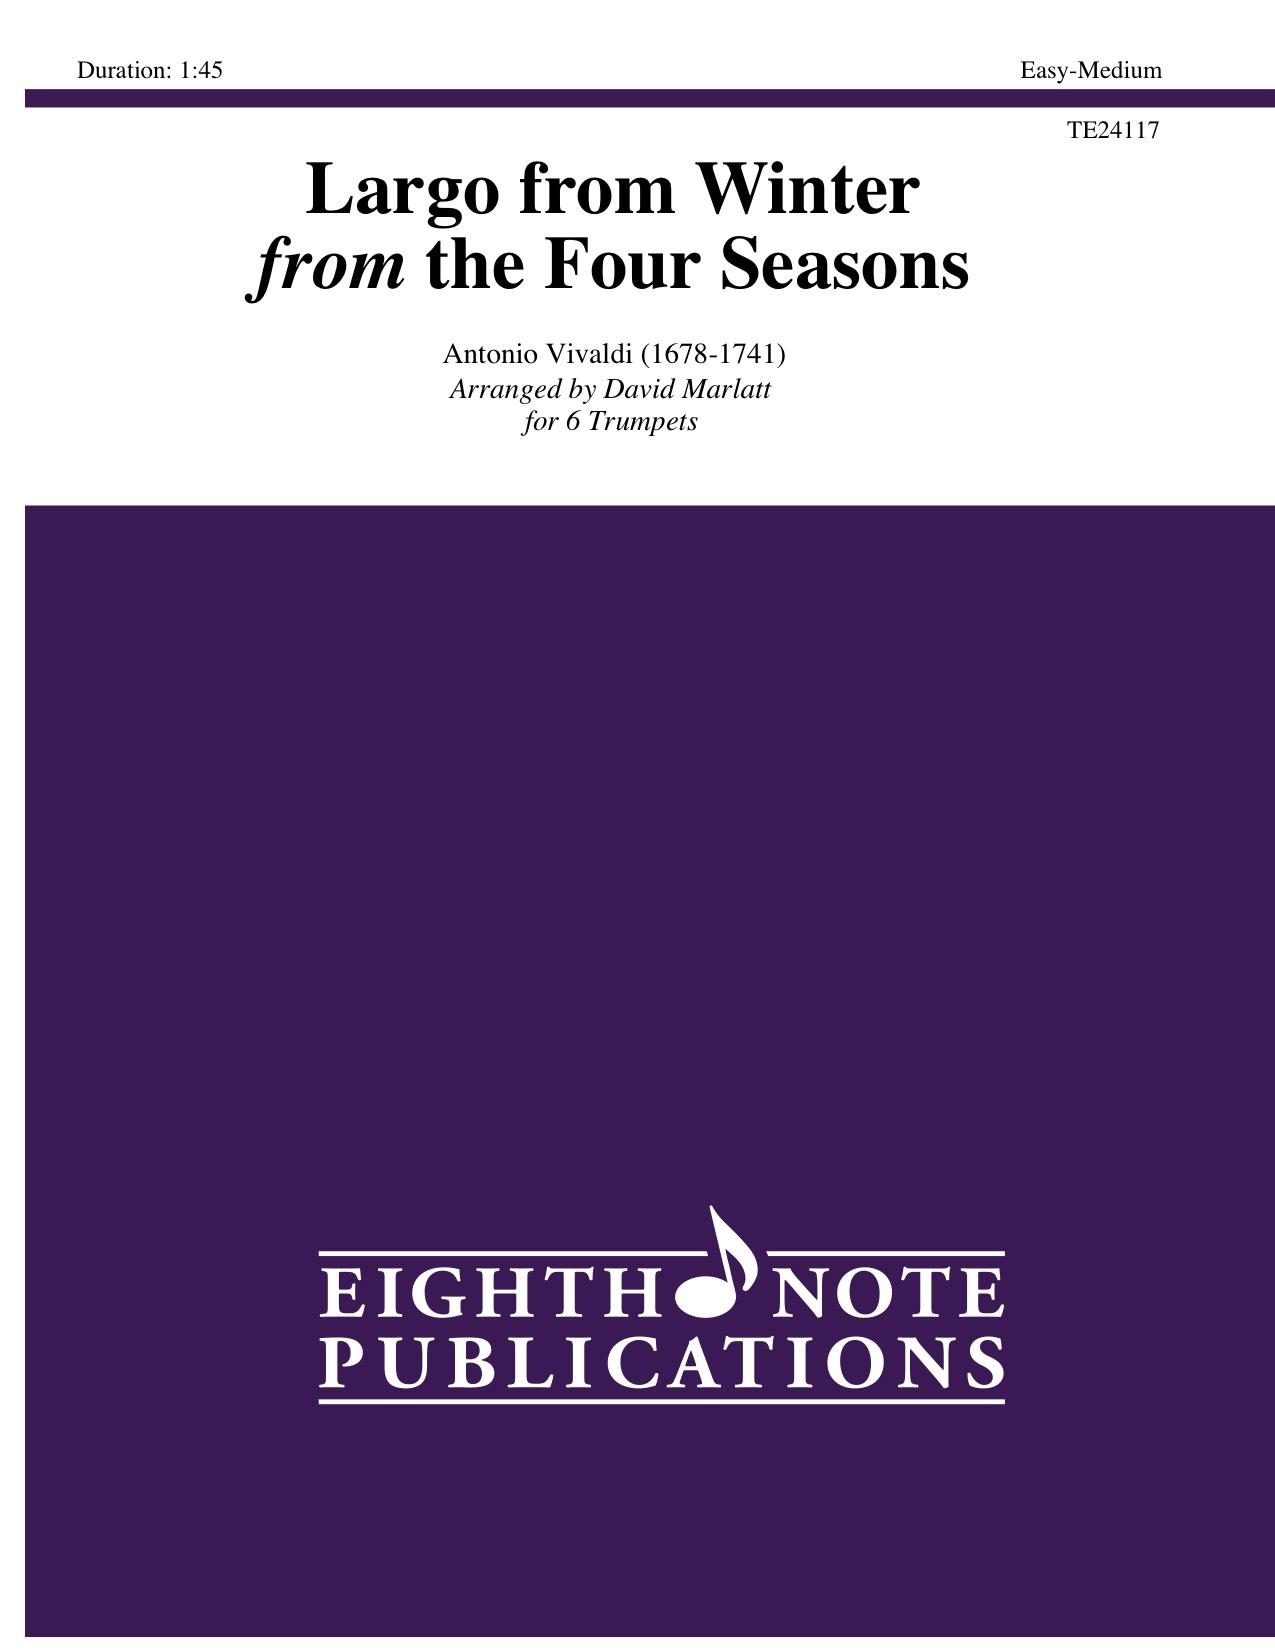 Largo from Winter - Four Seasons  - Antonio Vivaldi